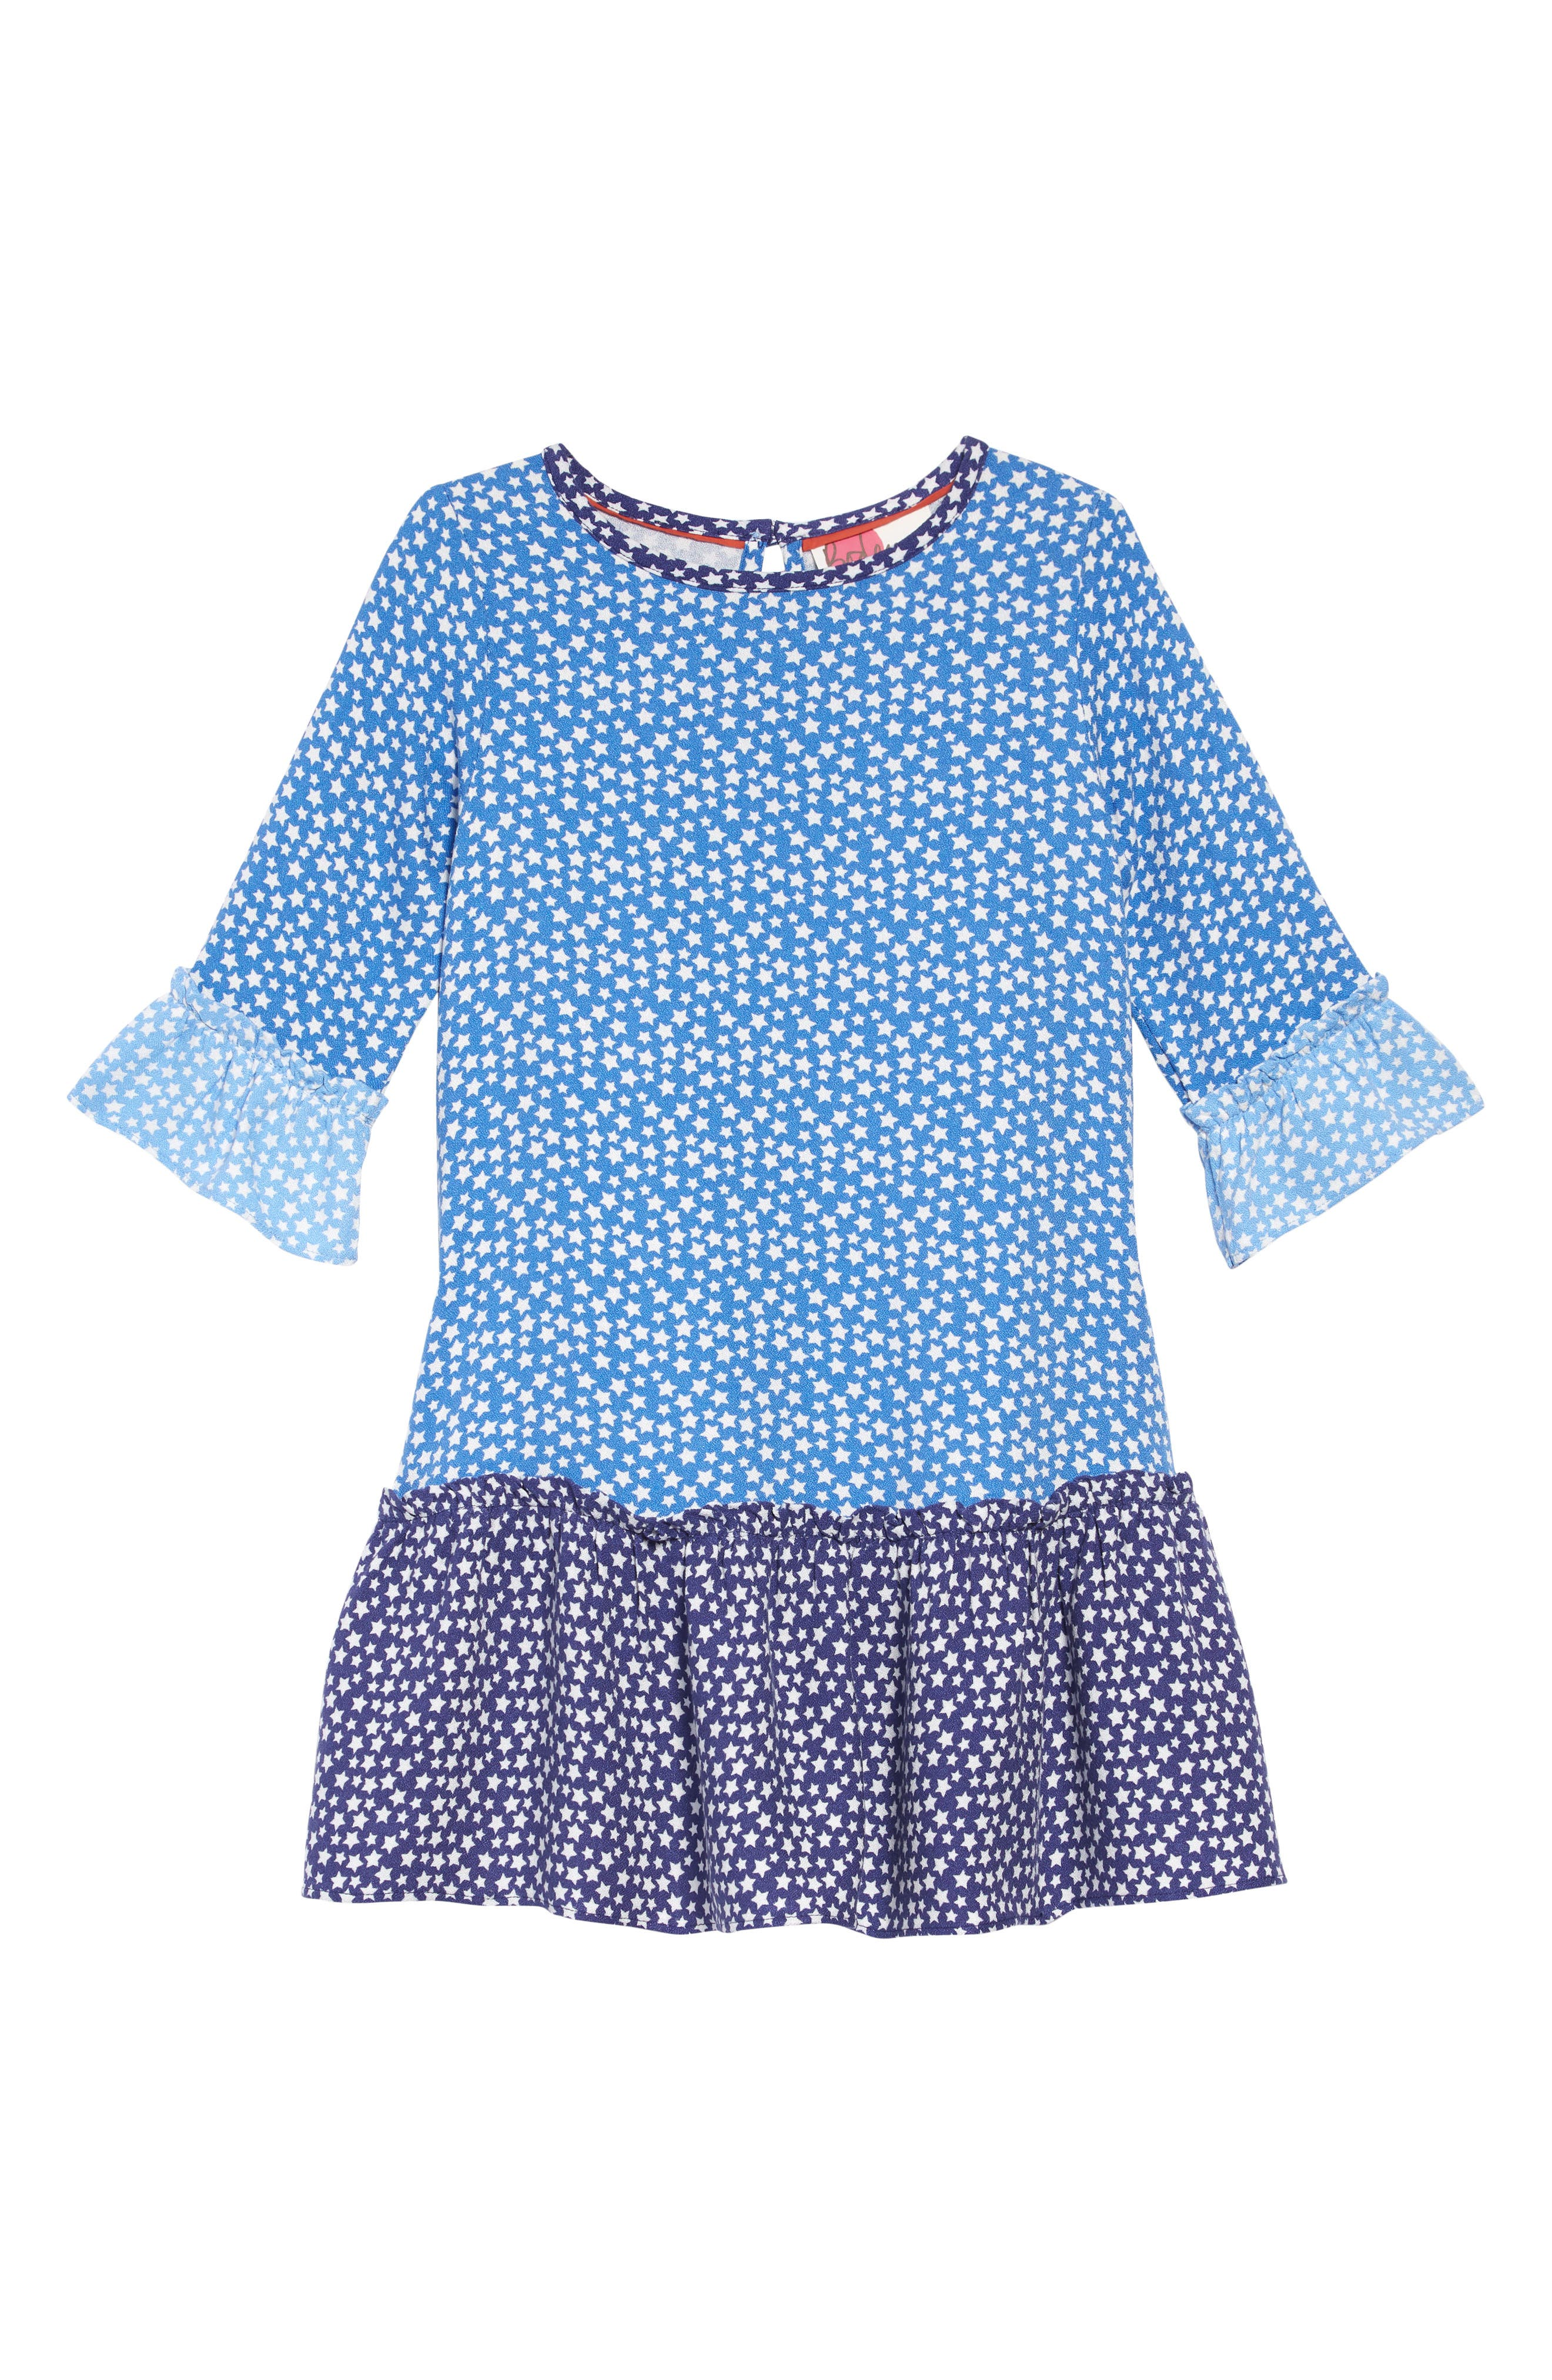 Girls Boden Frill Sleeve Print Dress Size 1112Y  Blue